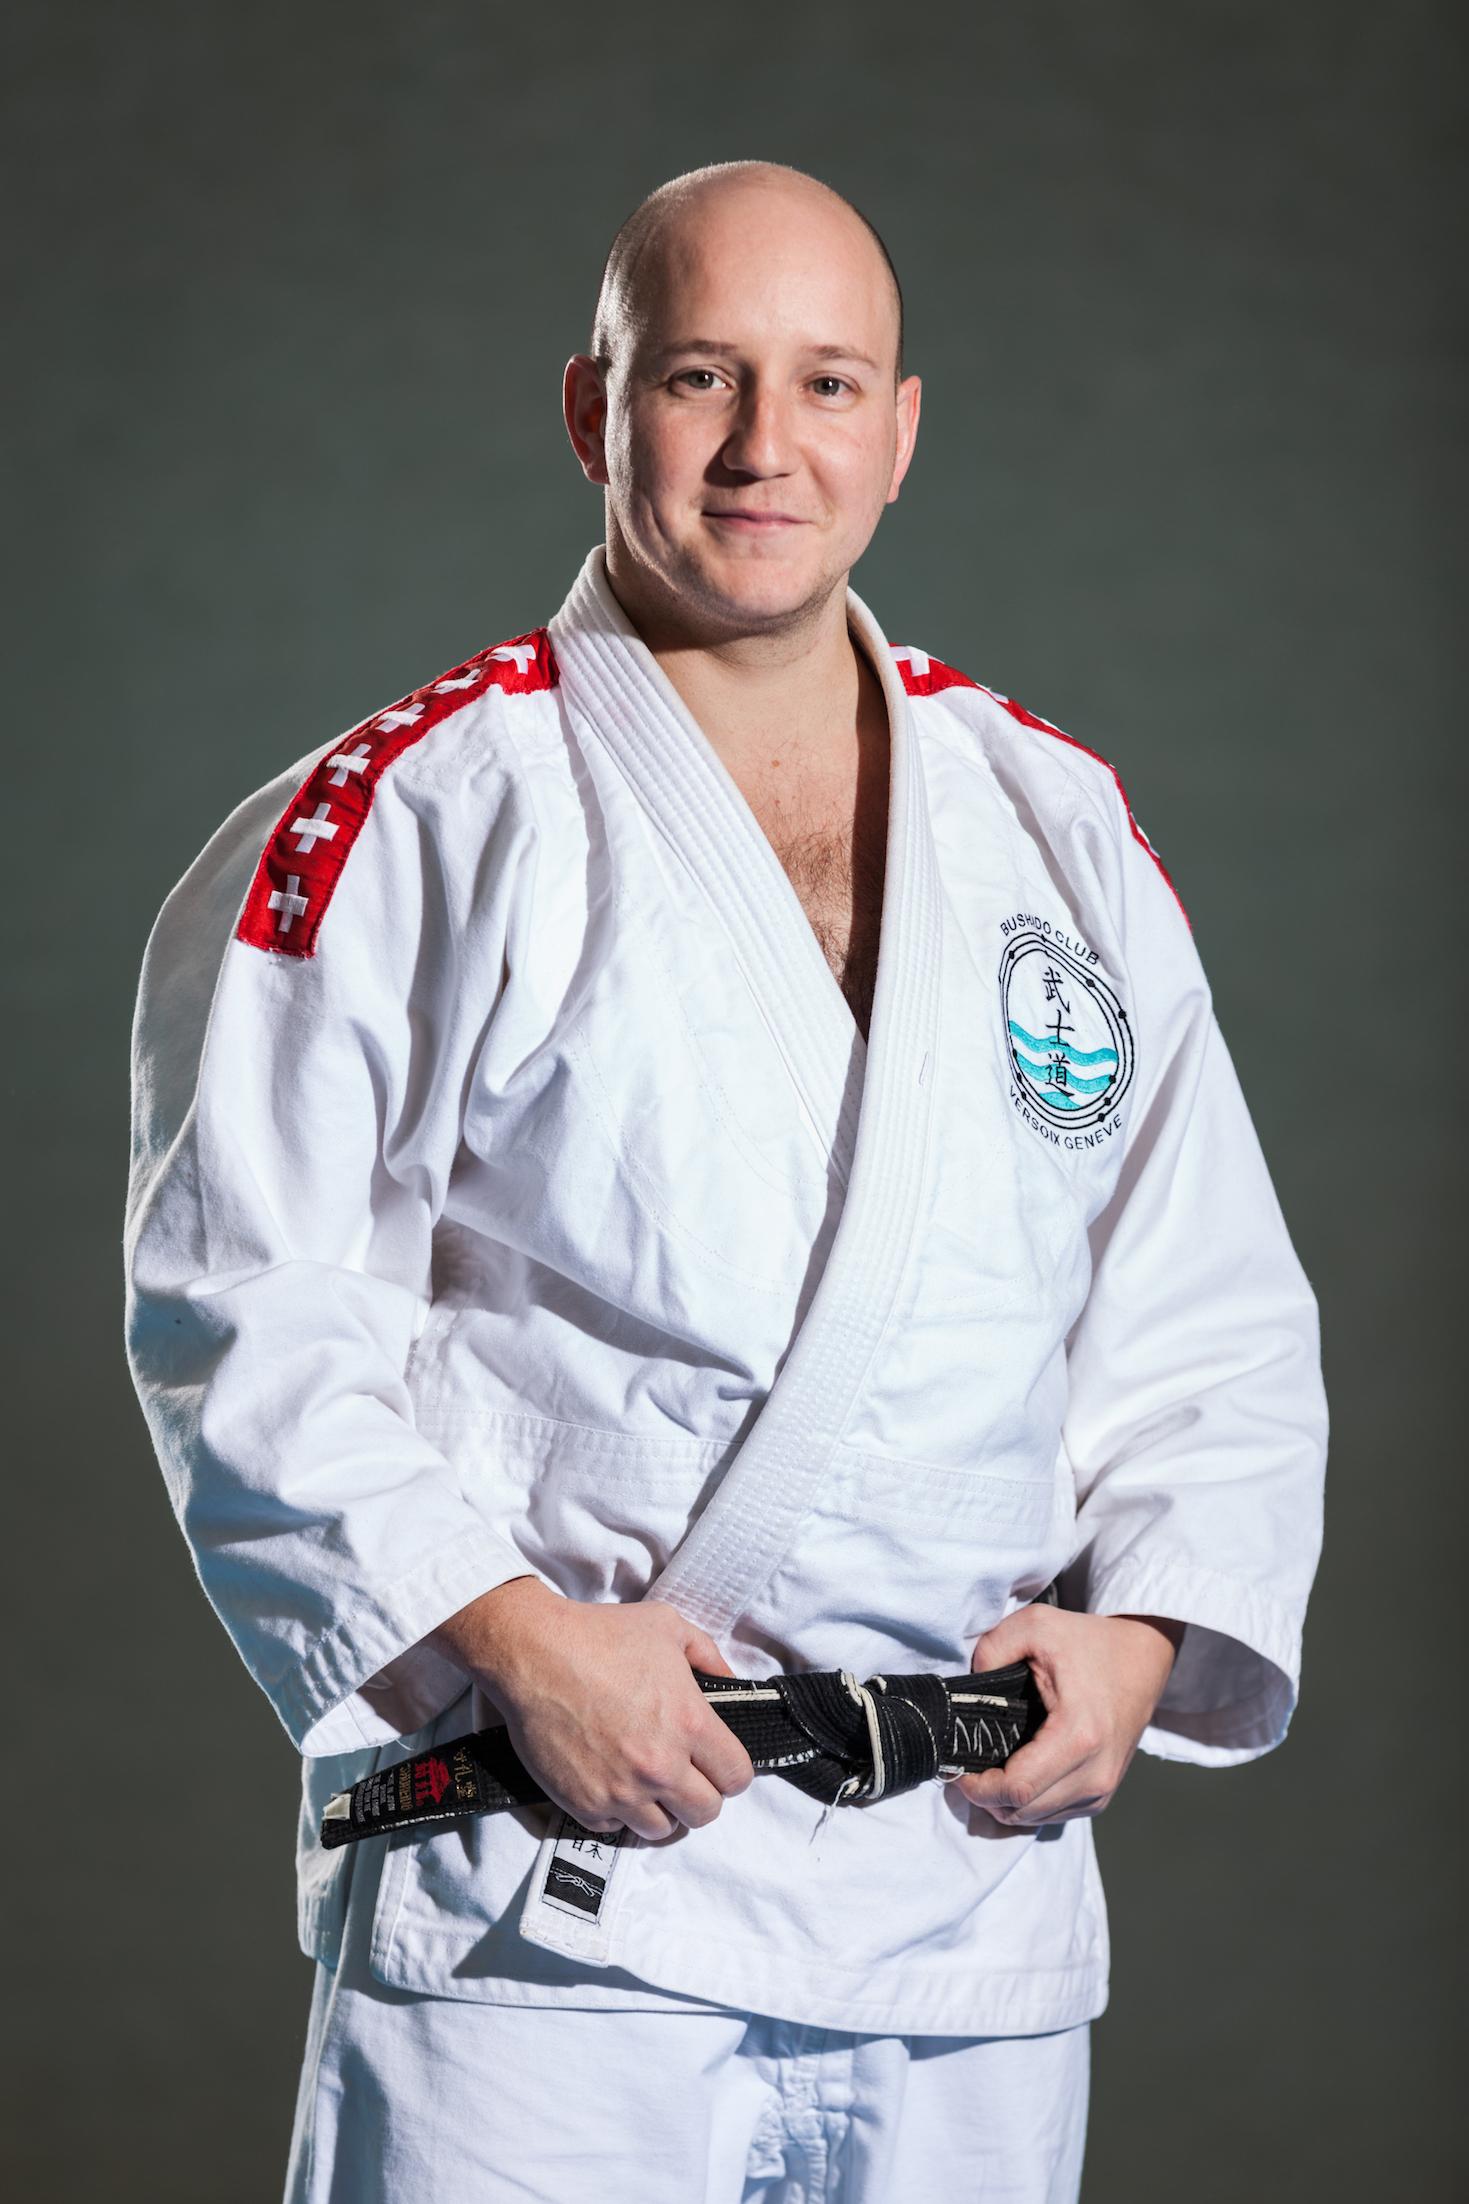 François Parodi